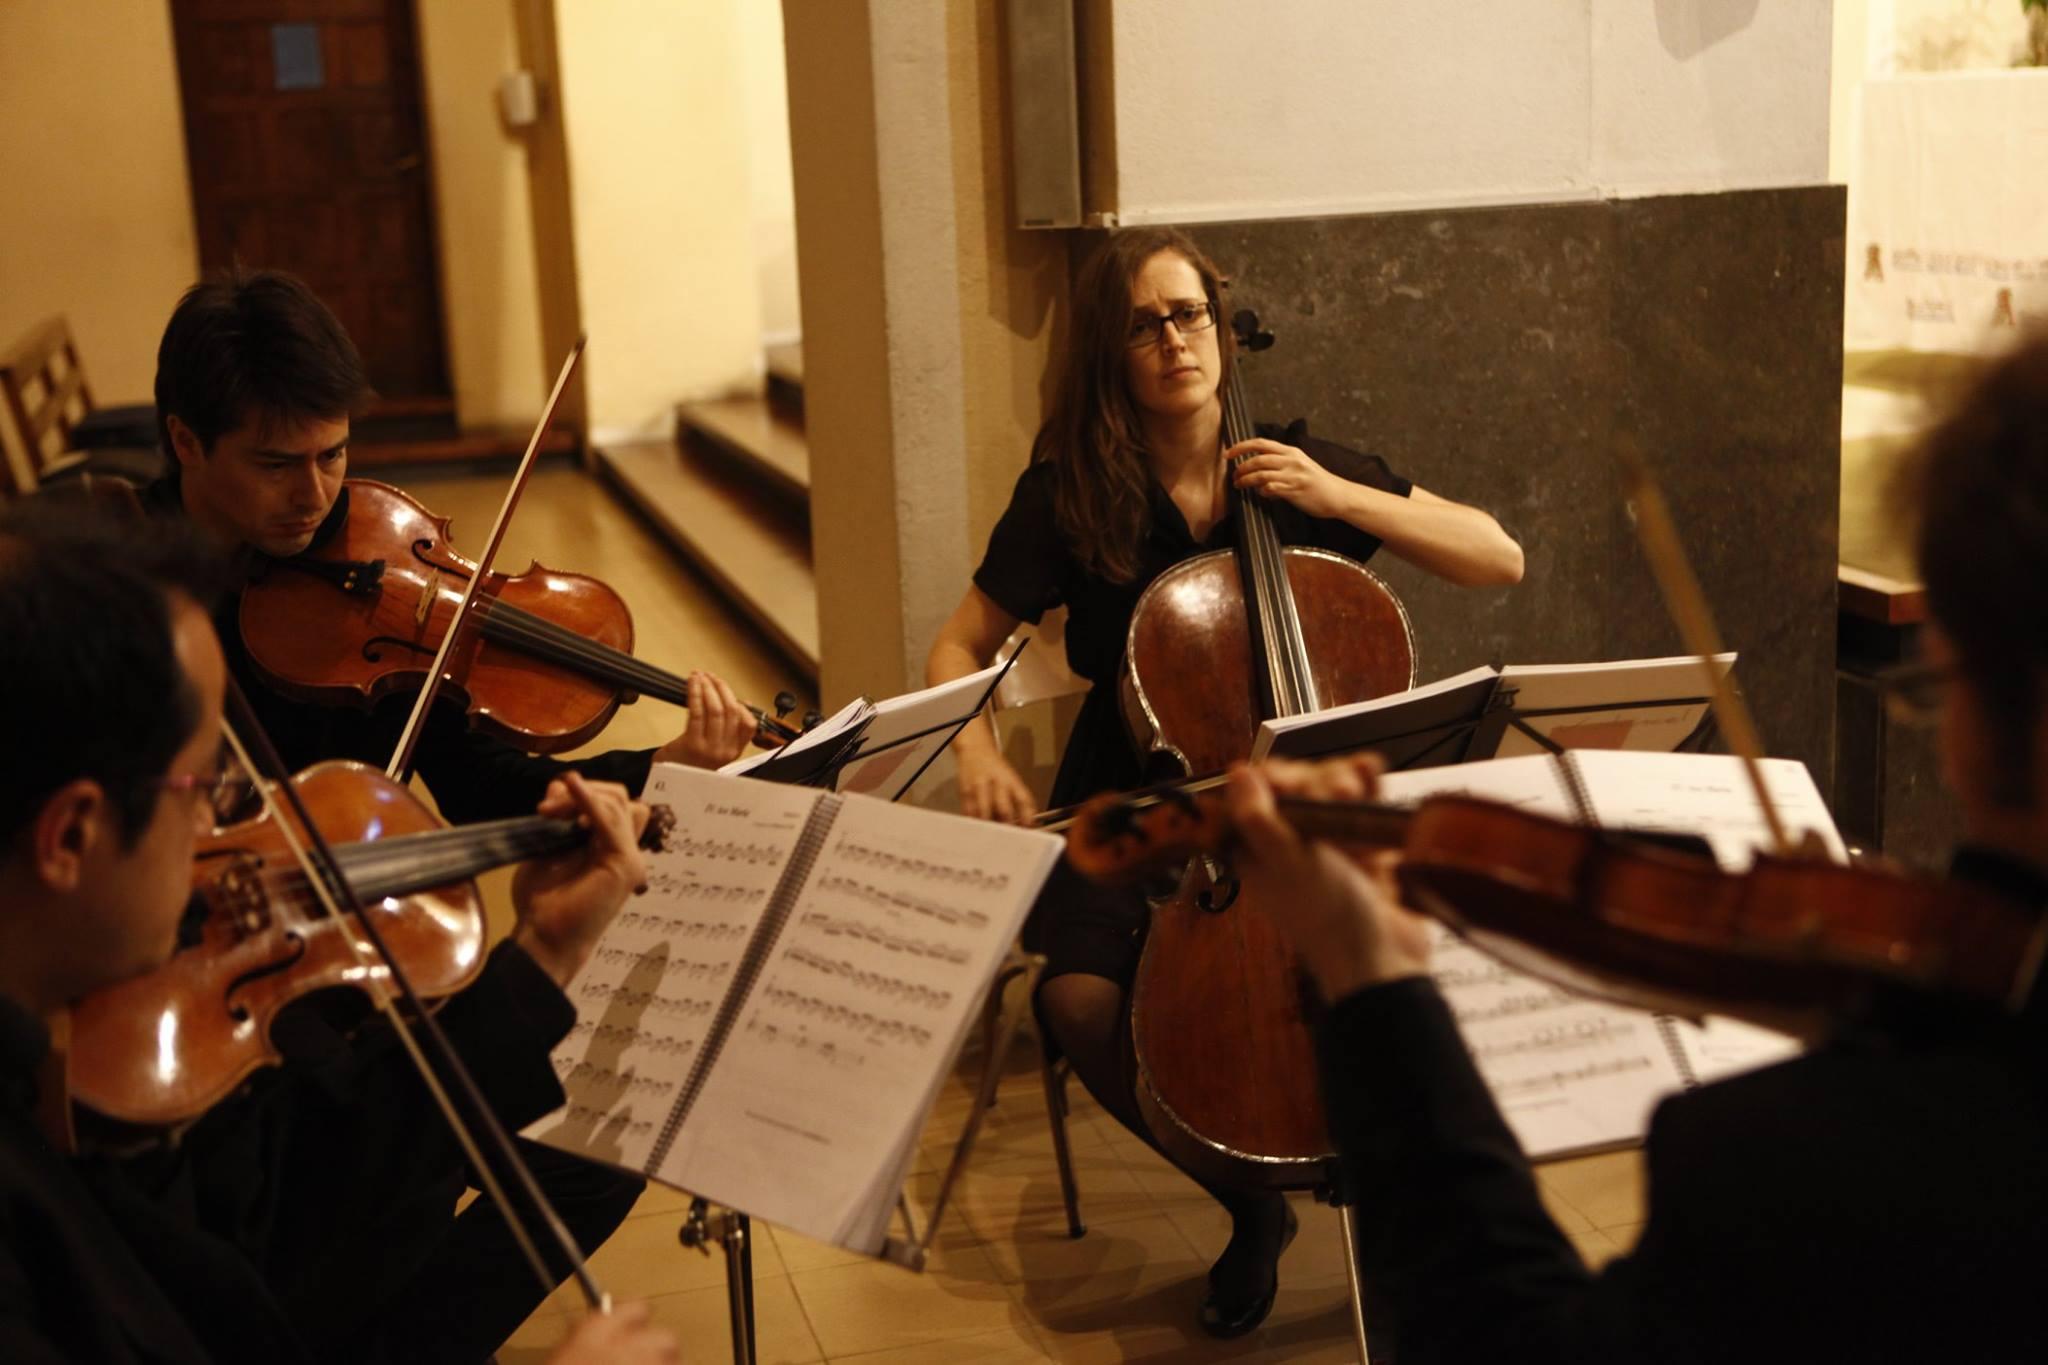 Quarteto boda barcelona